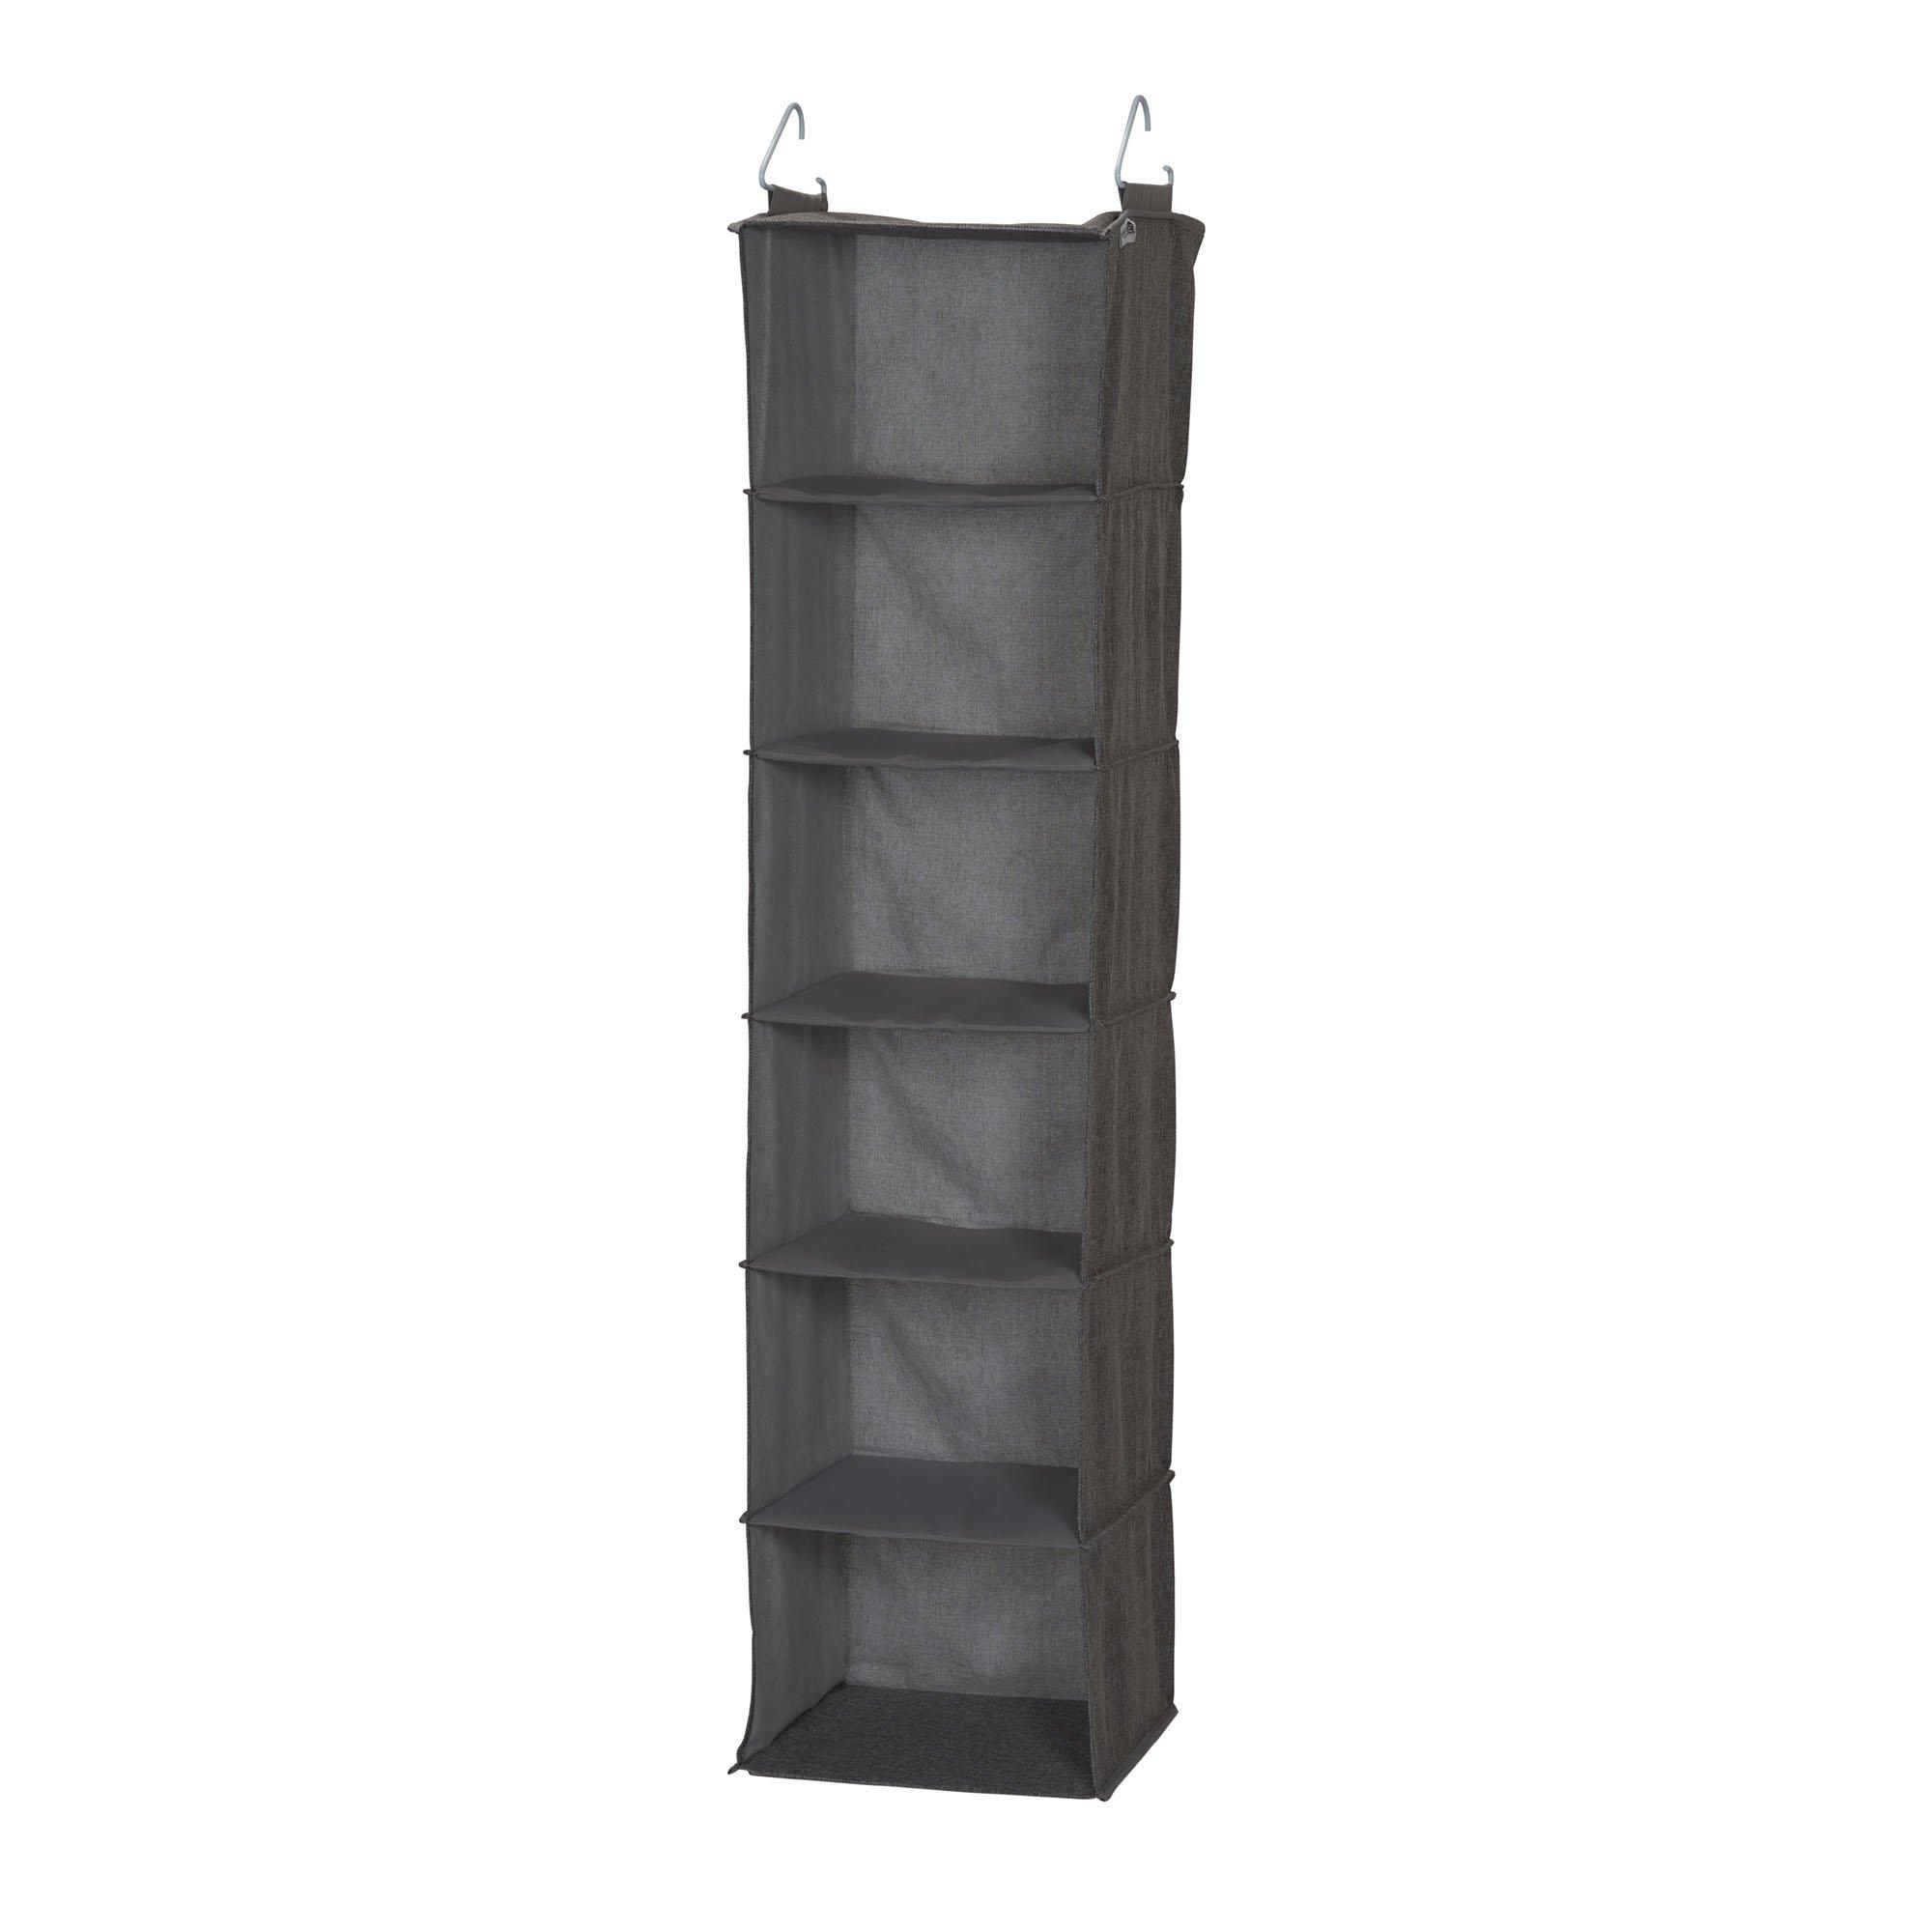 Household Essentials 66412 Linen 6 Shelf Hanging Closet Organizer, Gray